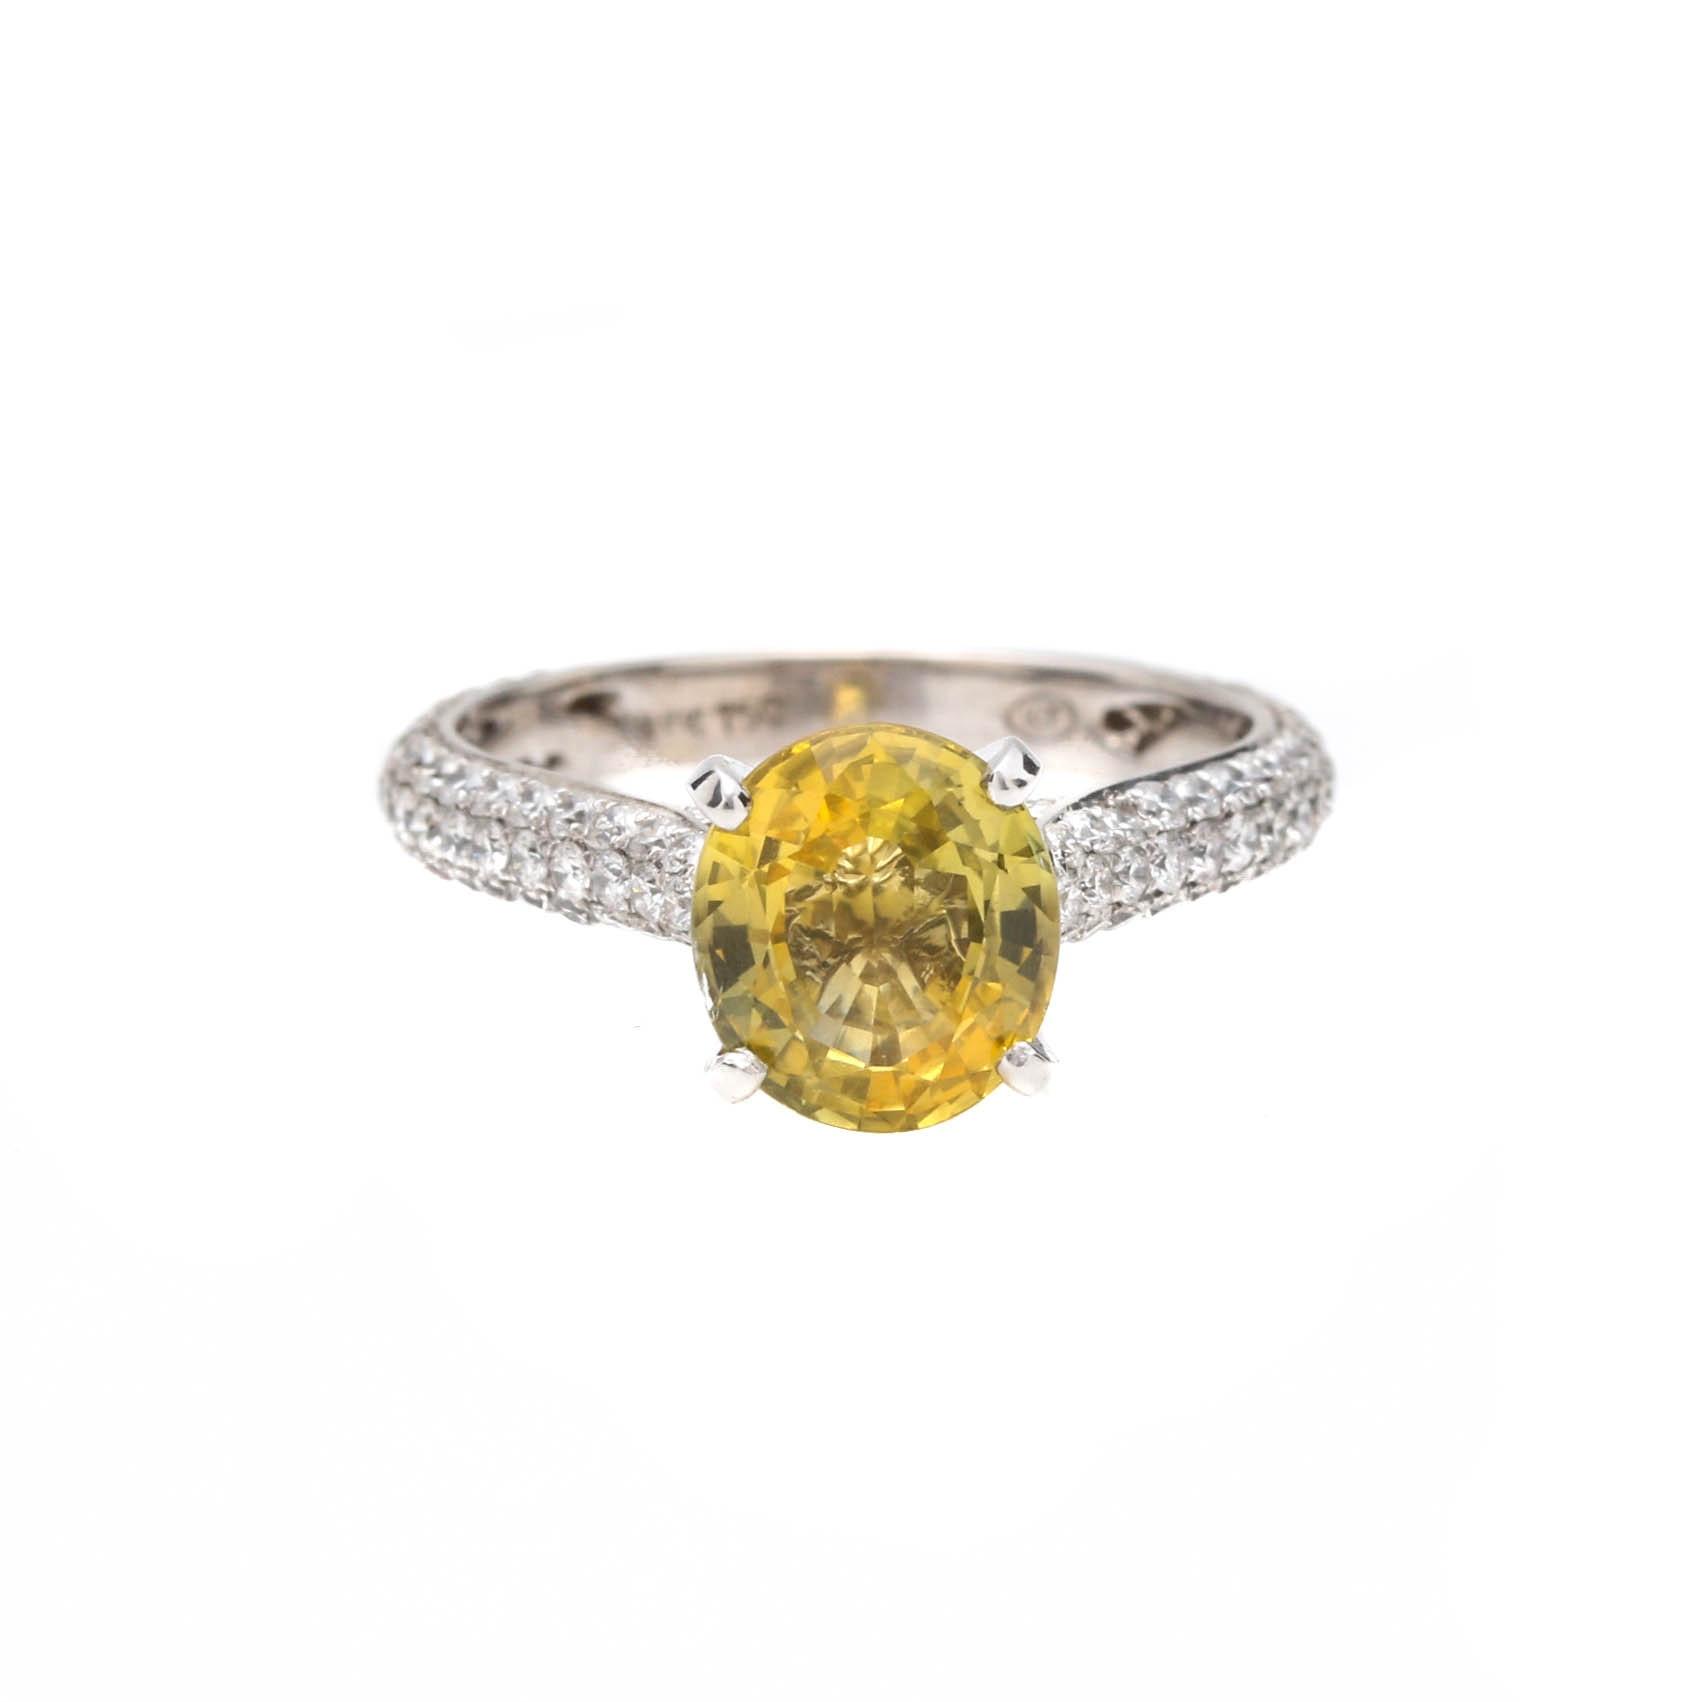 18K White Gold 2.00 CT Yellow Sapphire and Diamond Ring